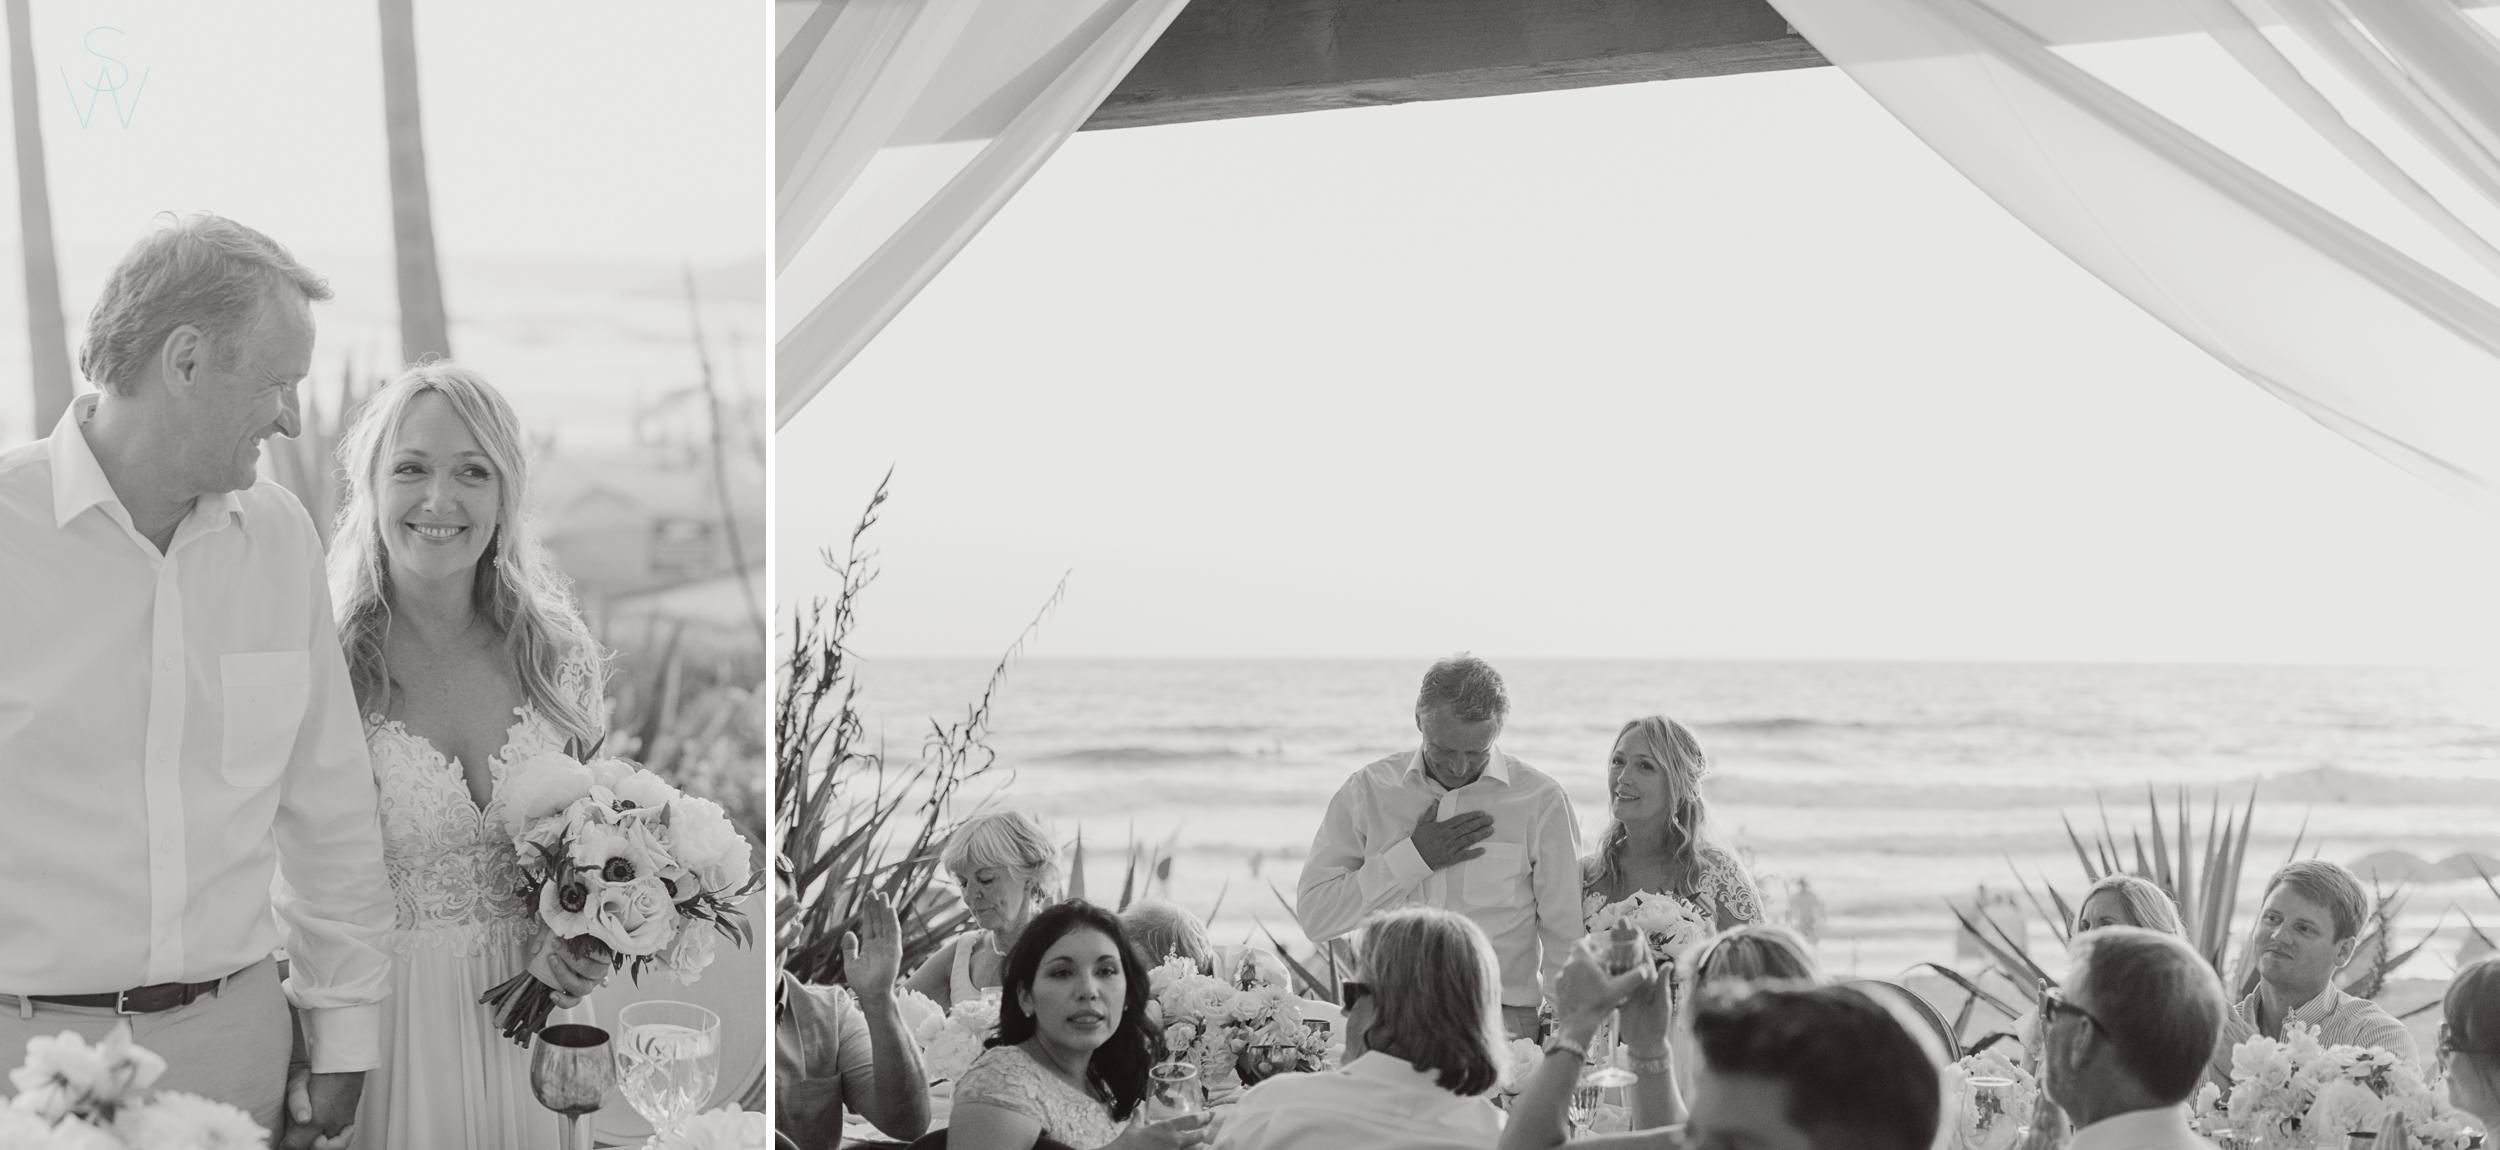 154DEL.MAR.WEDDINGS.photography.shewanders.JPG